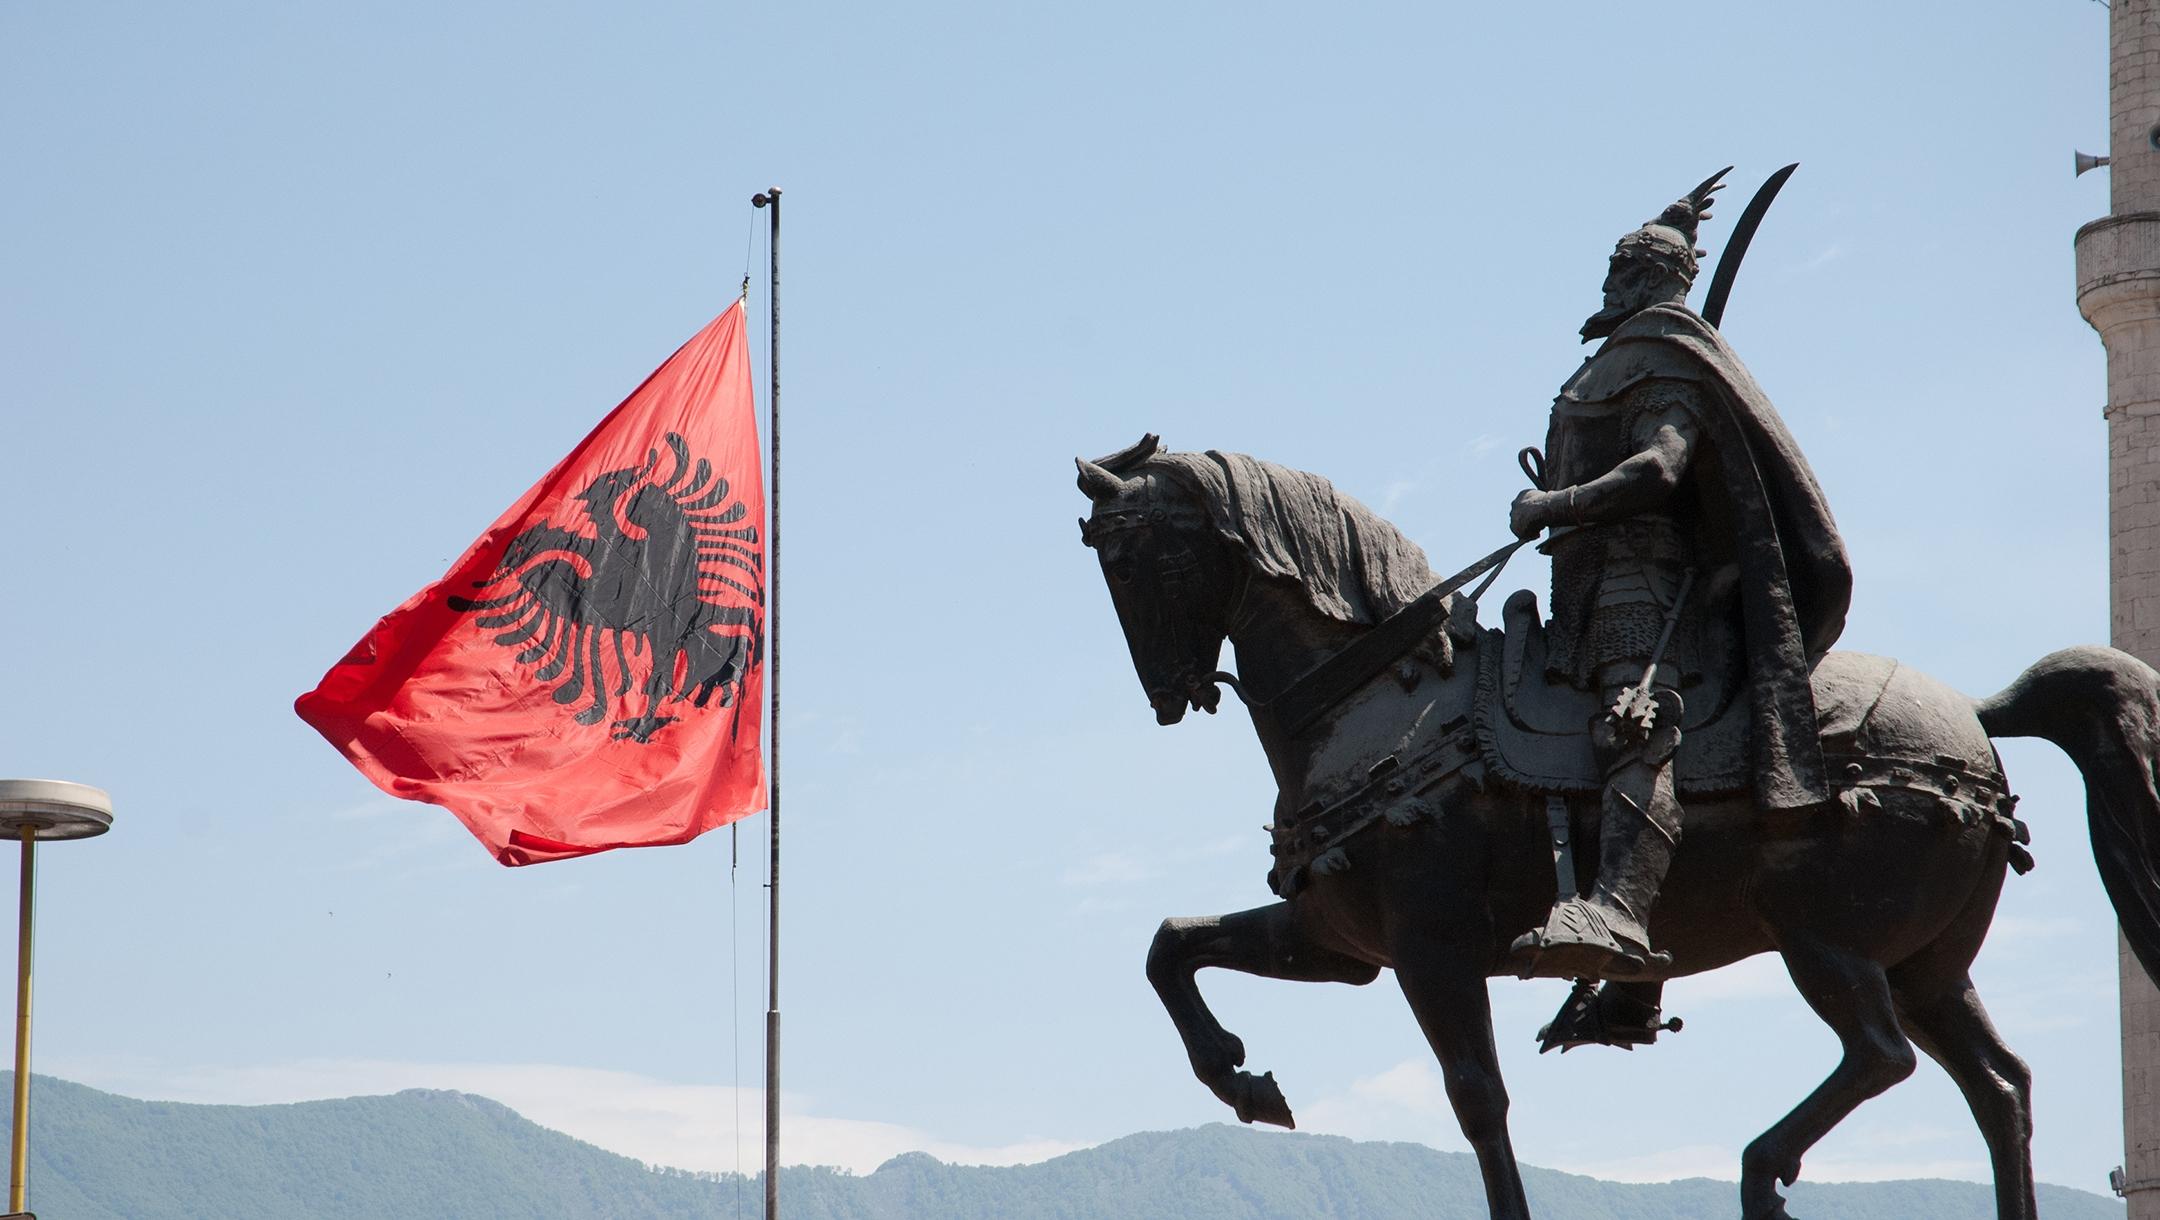 Albania adopts International Holocaust Remembrance Alliance's definition of anti-Semitism